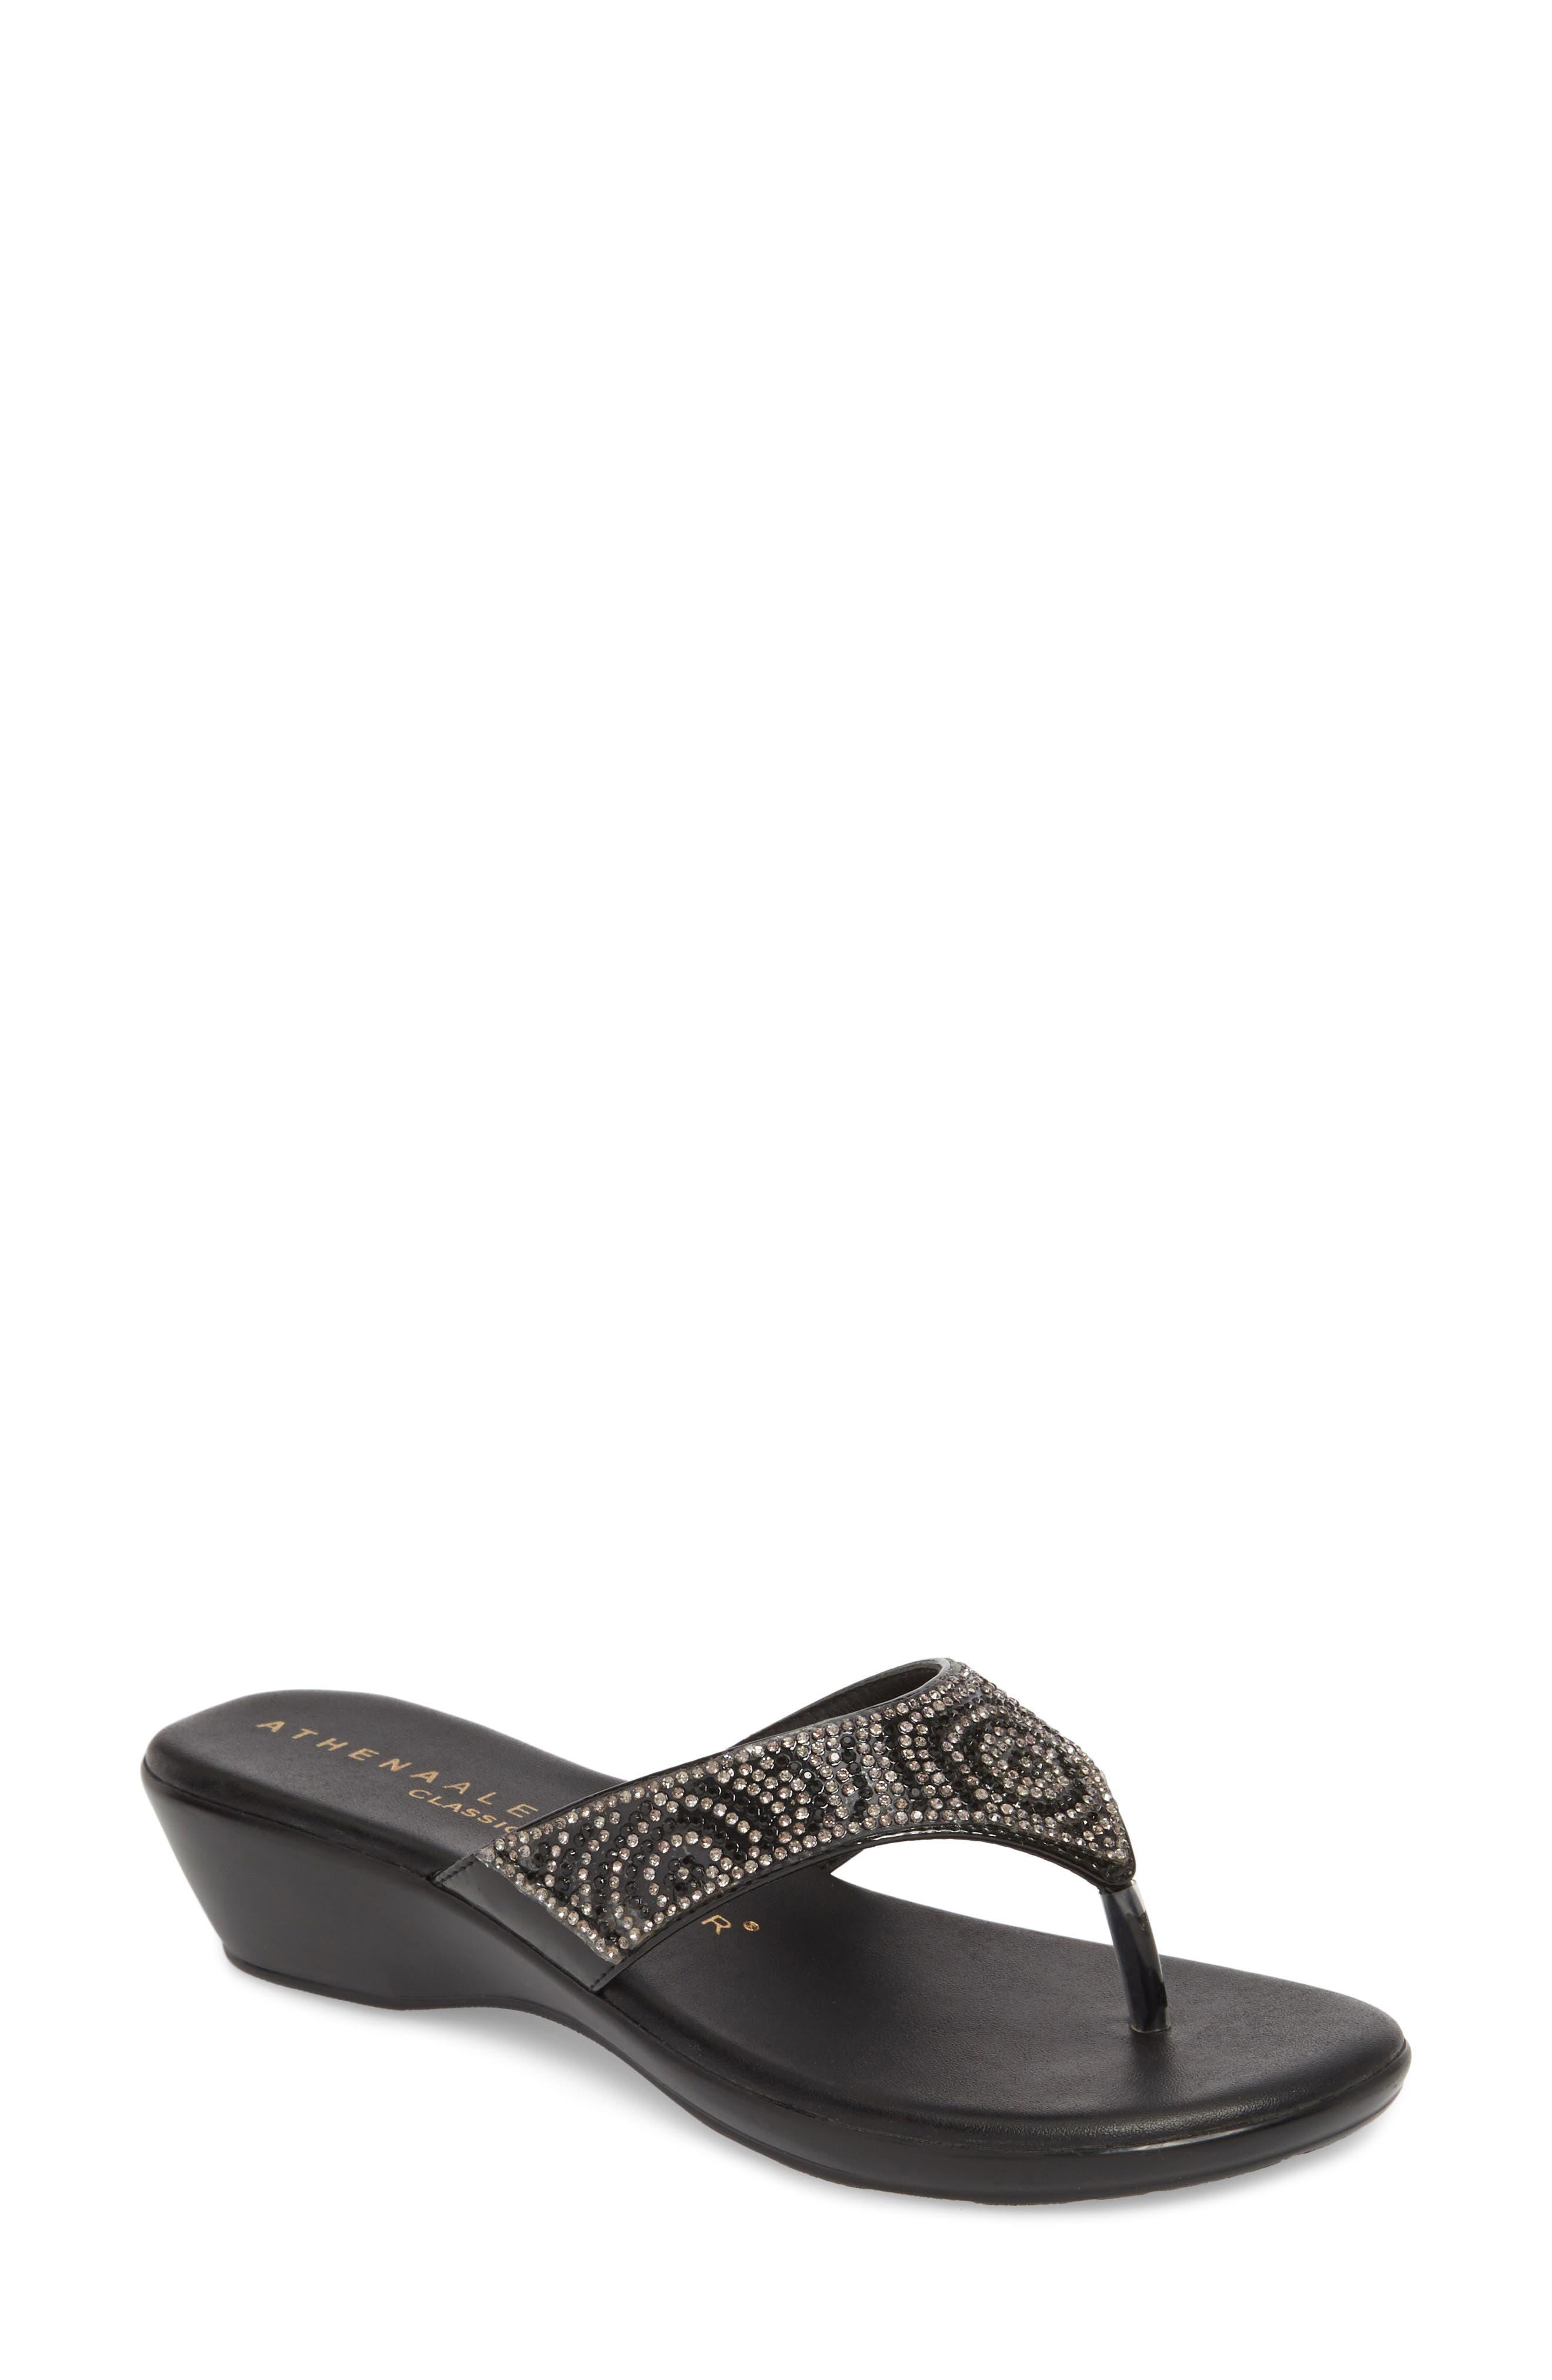 Shady Slide Sandal,                         Main,                         color, 001